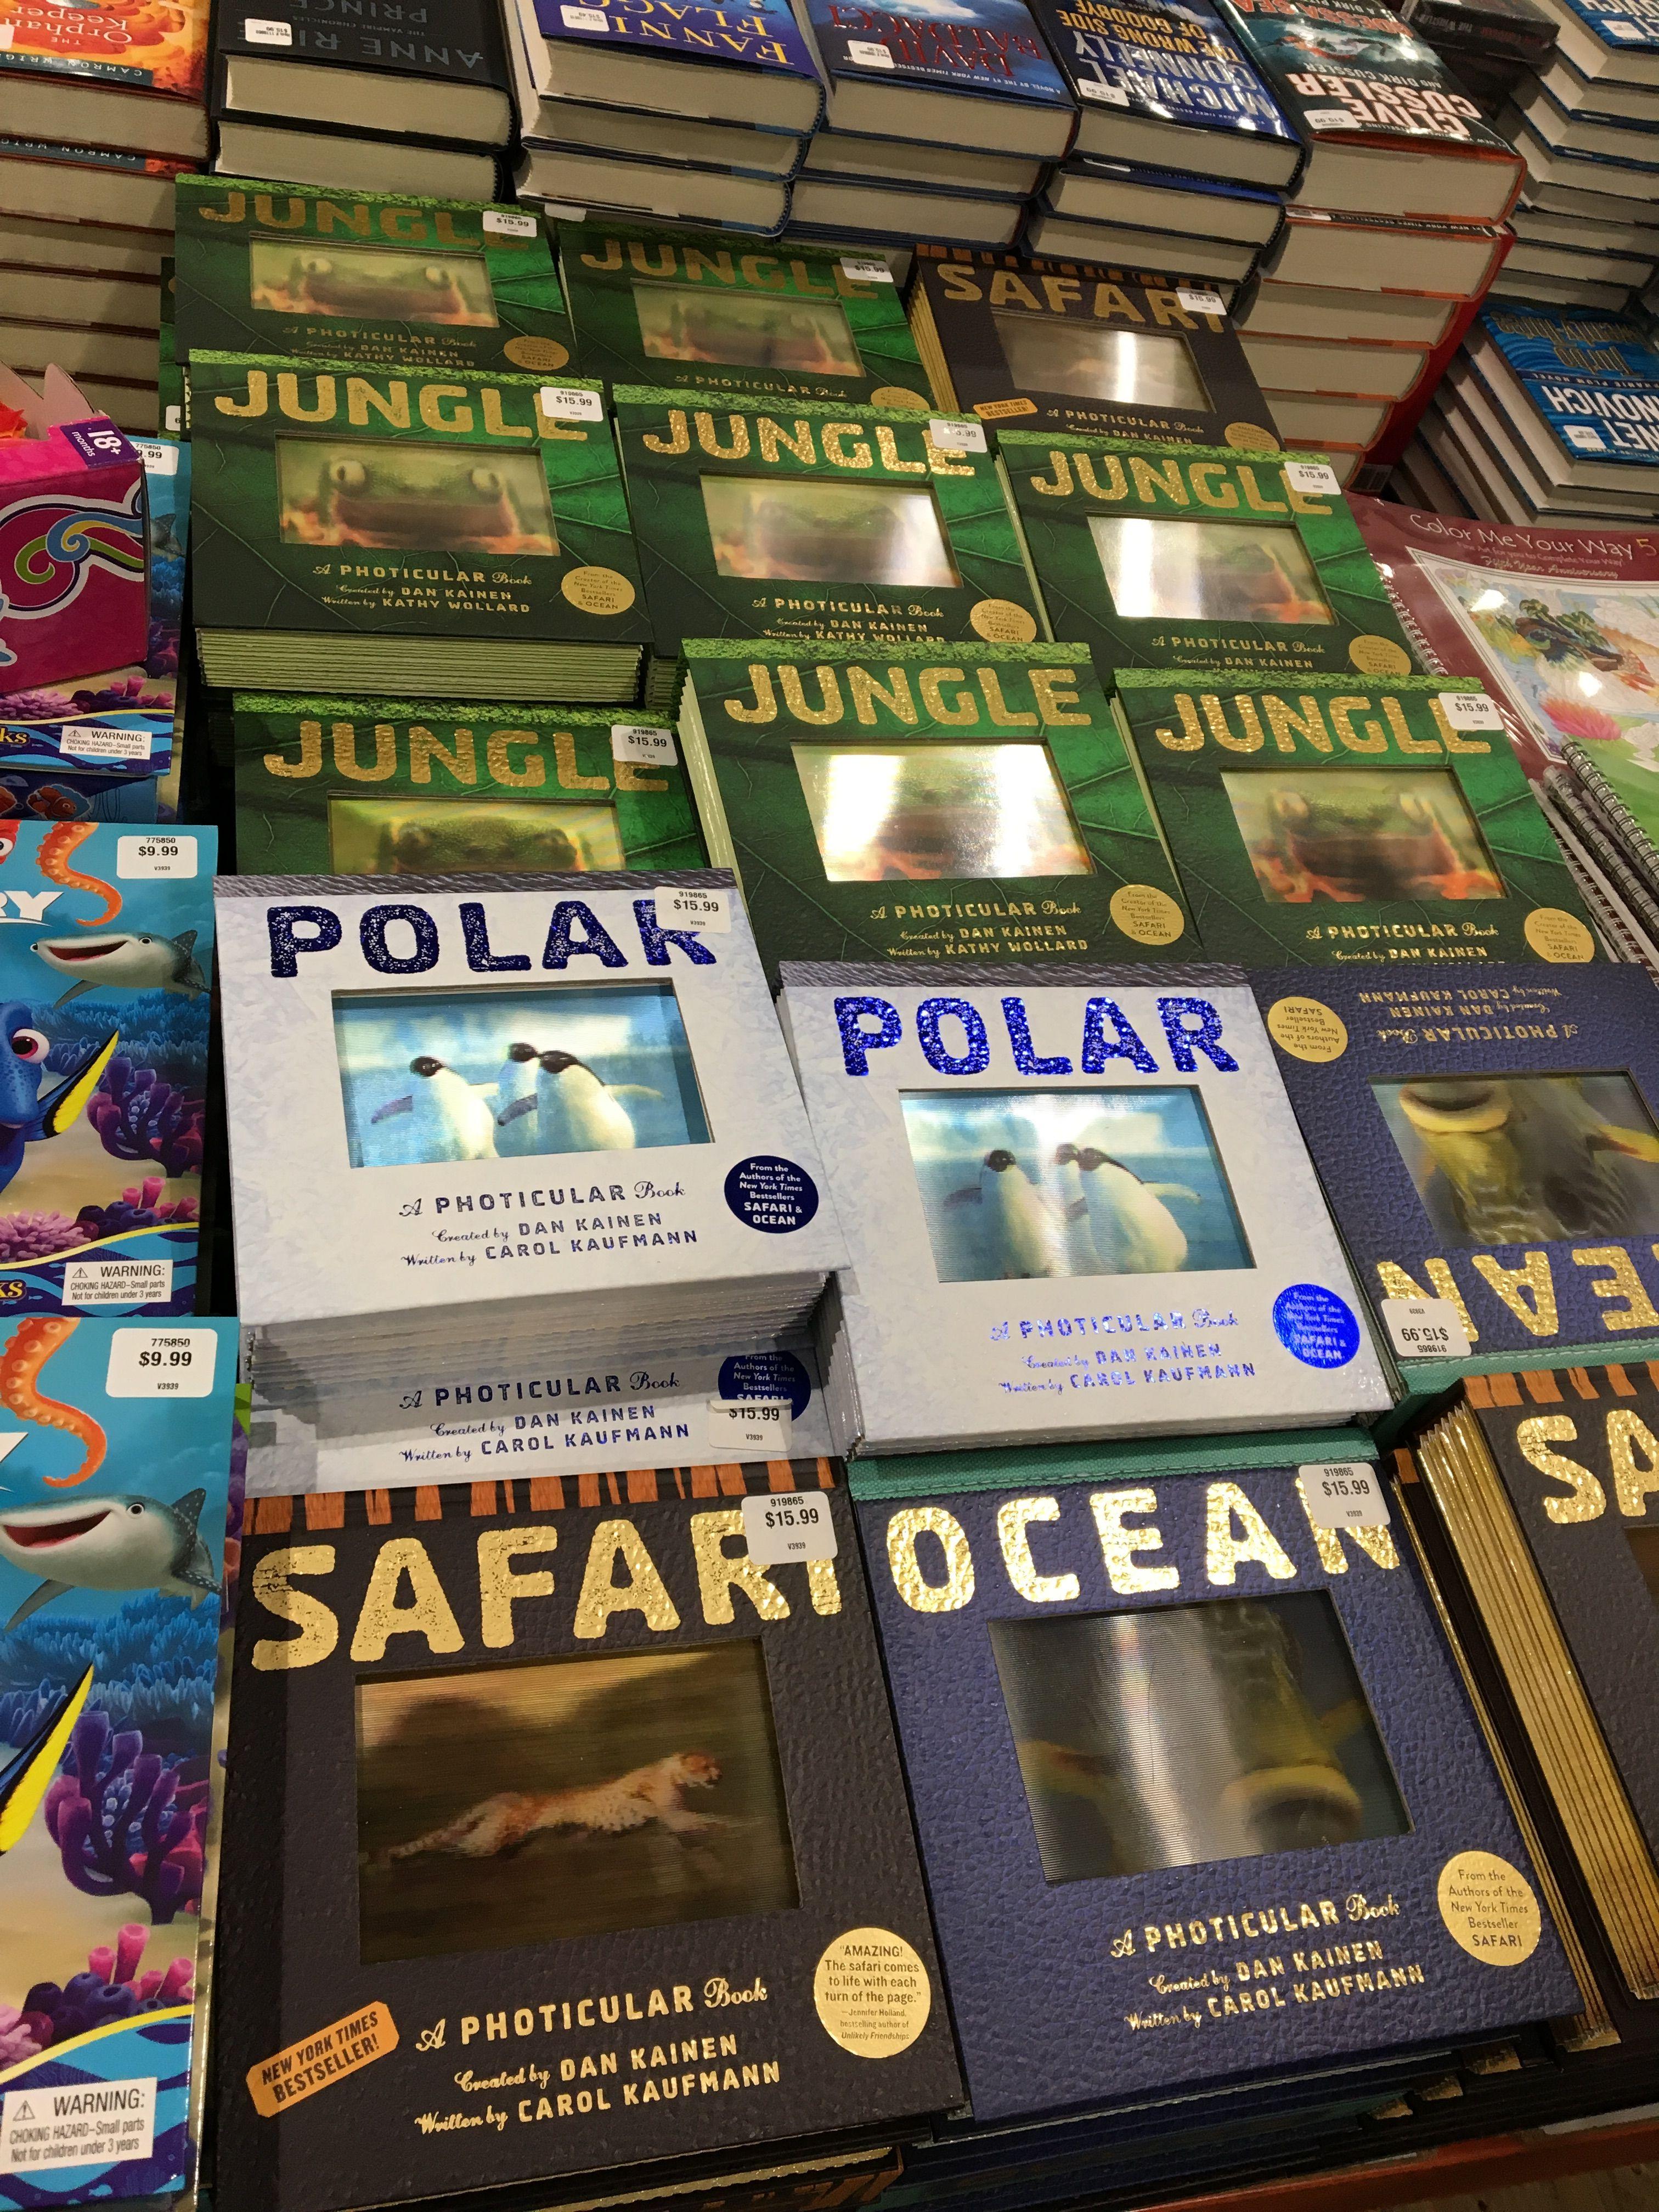 Anima moving books Were sold at Costco Buy